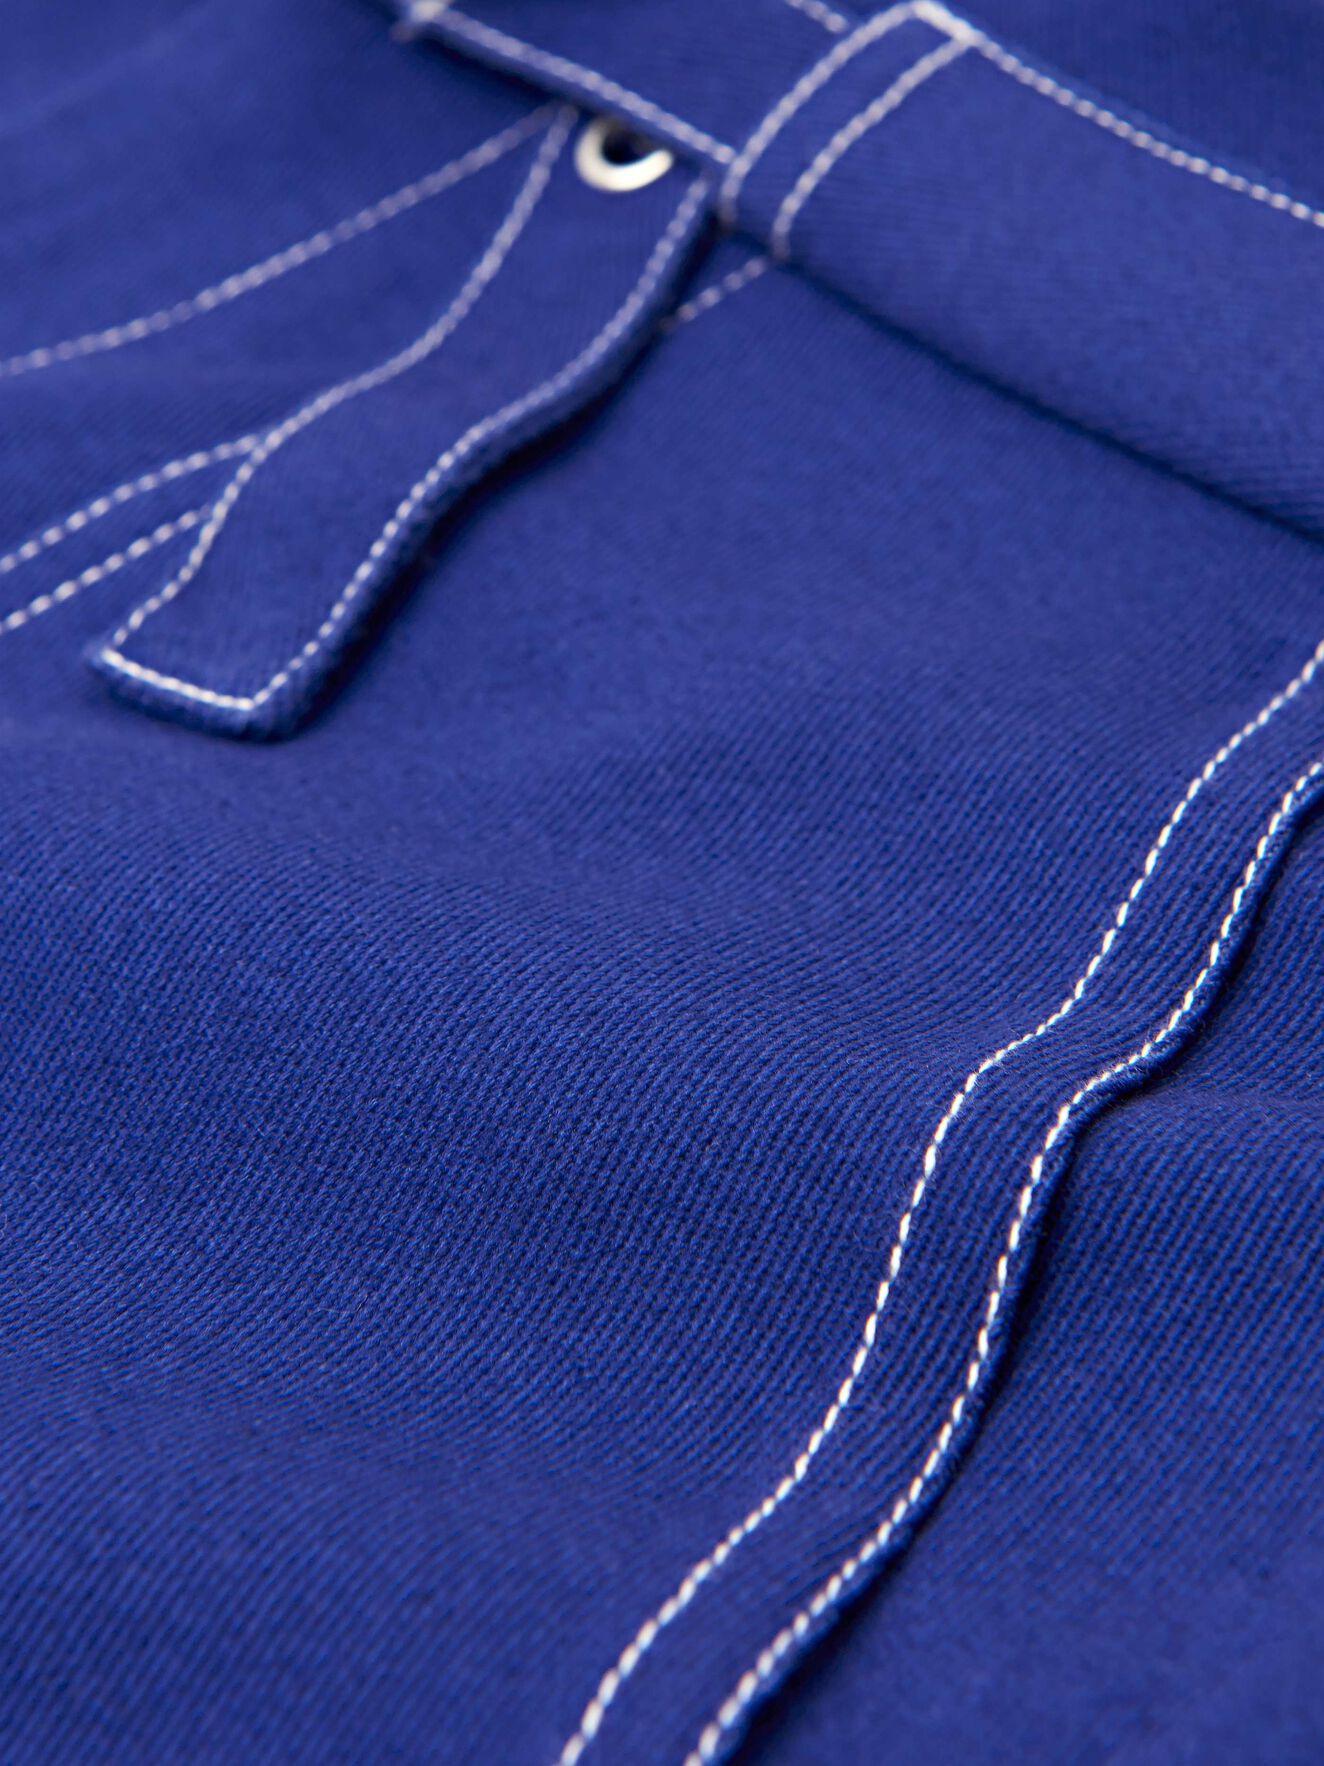 Popsicle Skirt in Deep Ocean Blue from Tiger of Sweden